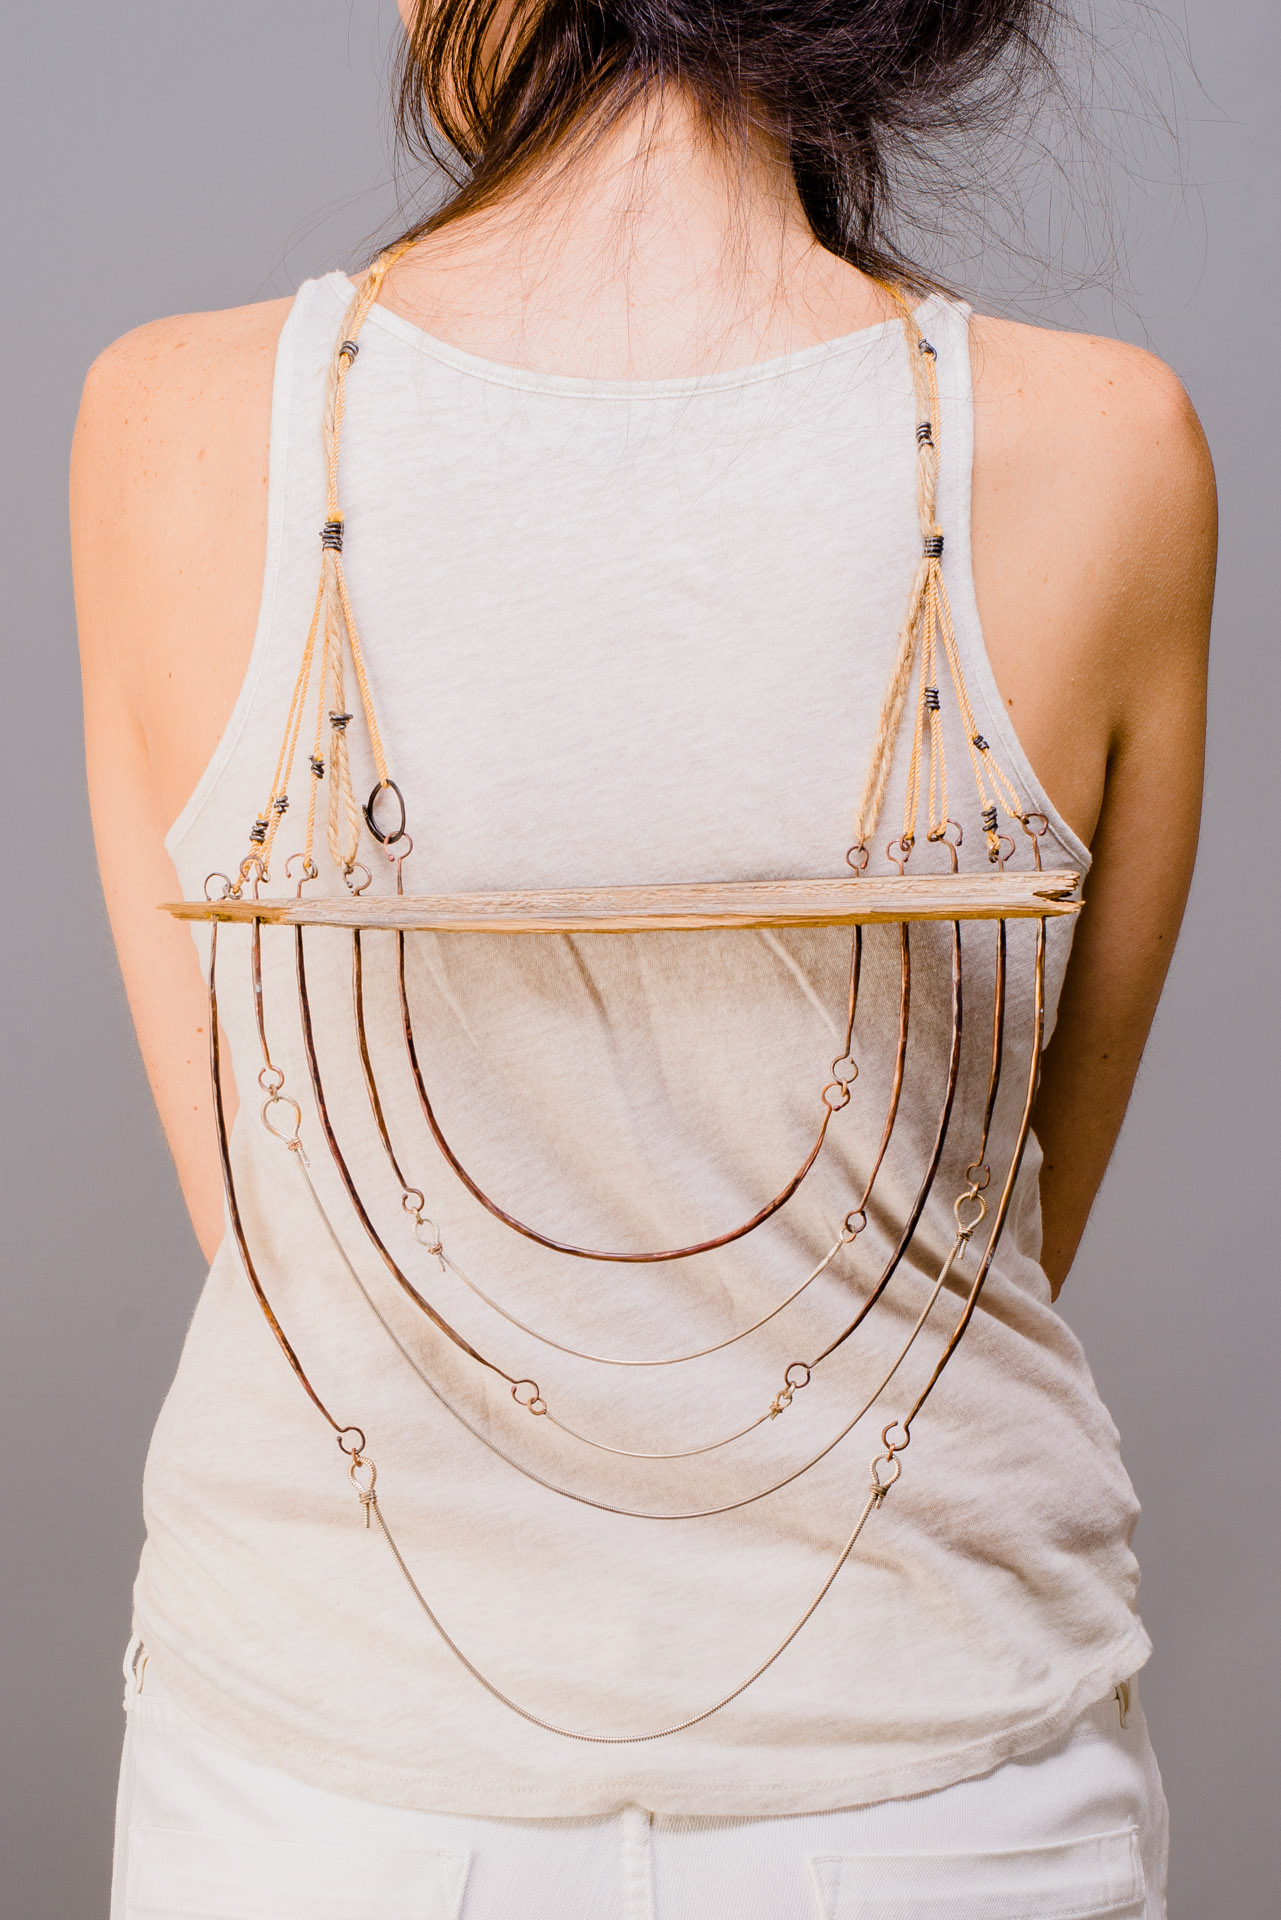 Parallel    Lindsay Miś, 2014  Silver, copper, steel, wood, cord, jute